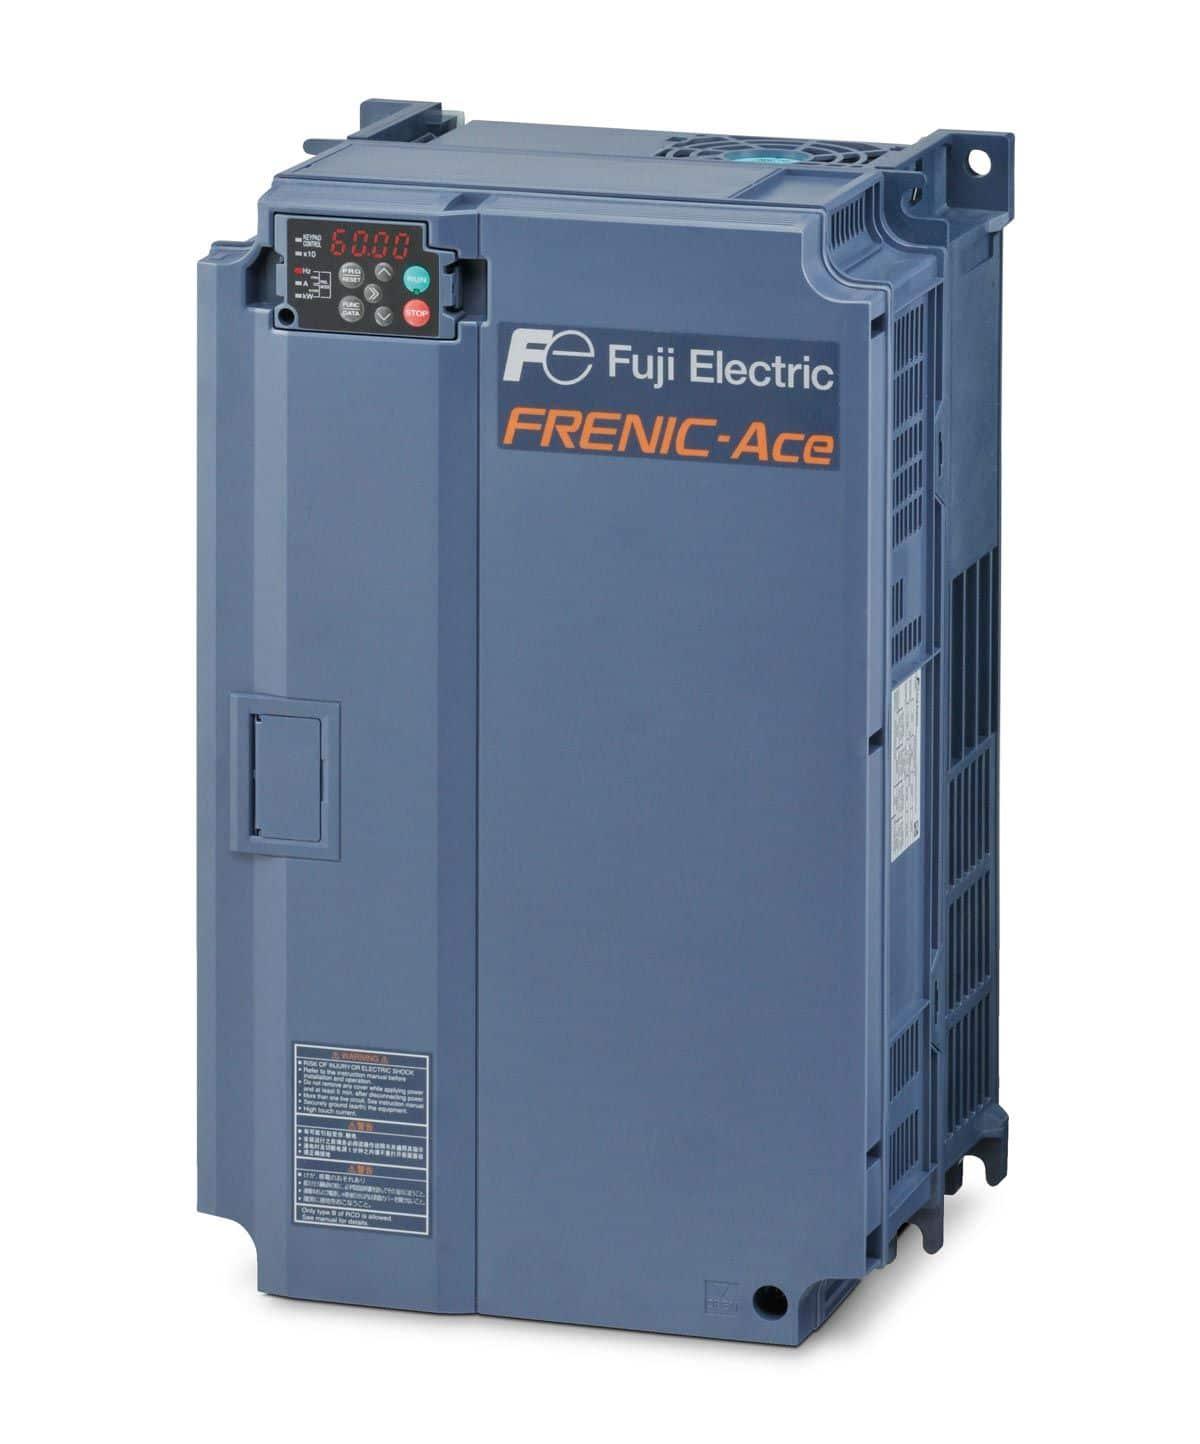 Vfd drives industrial power inverter ac drives fuji electric frenic mini c2 frenic ace sciox Images